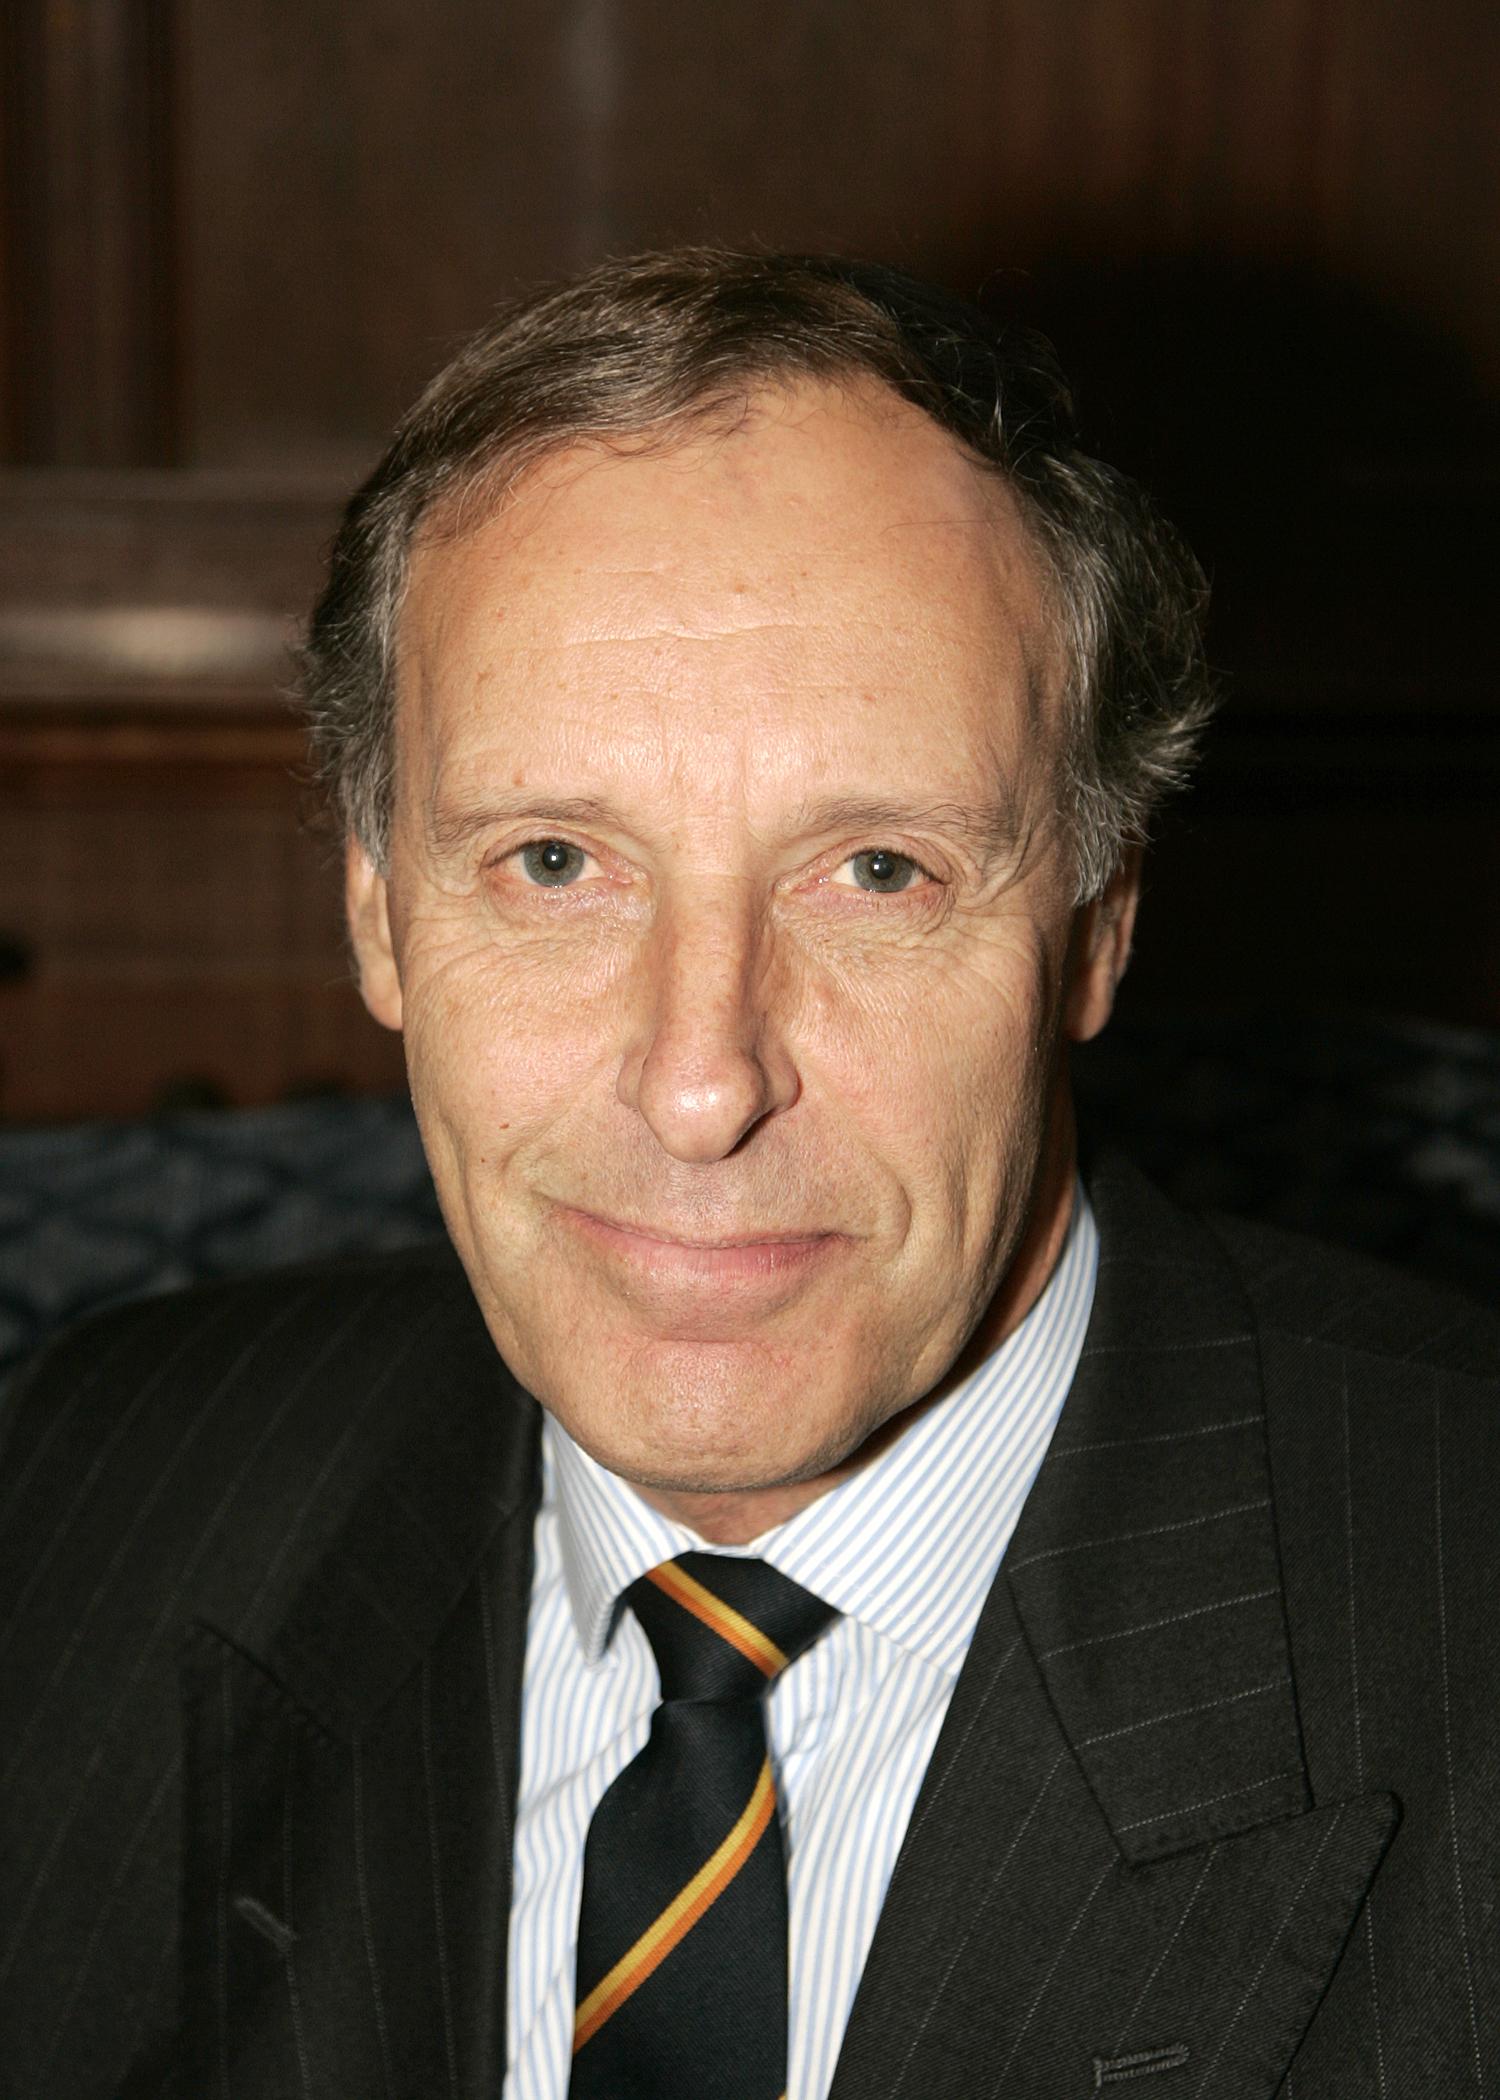 COL (RETD) PETER WILLIAMS OBE